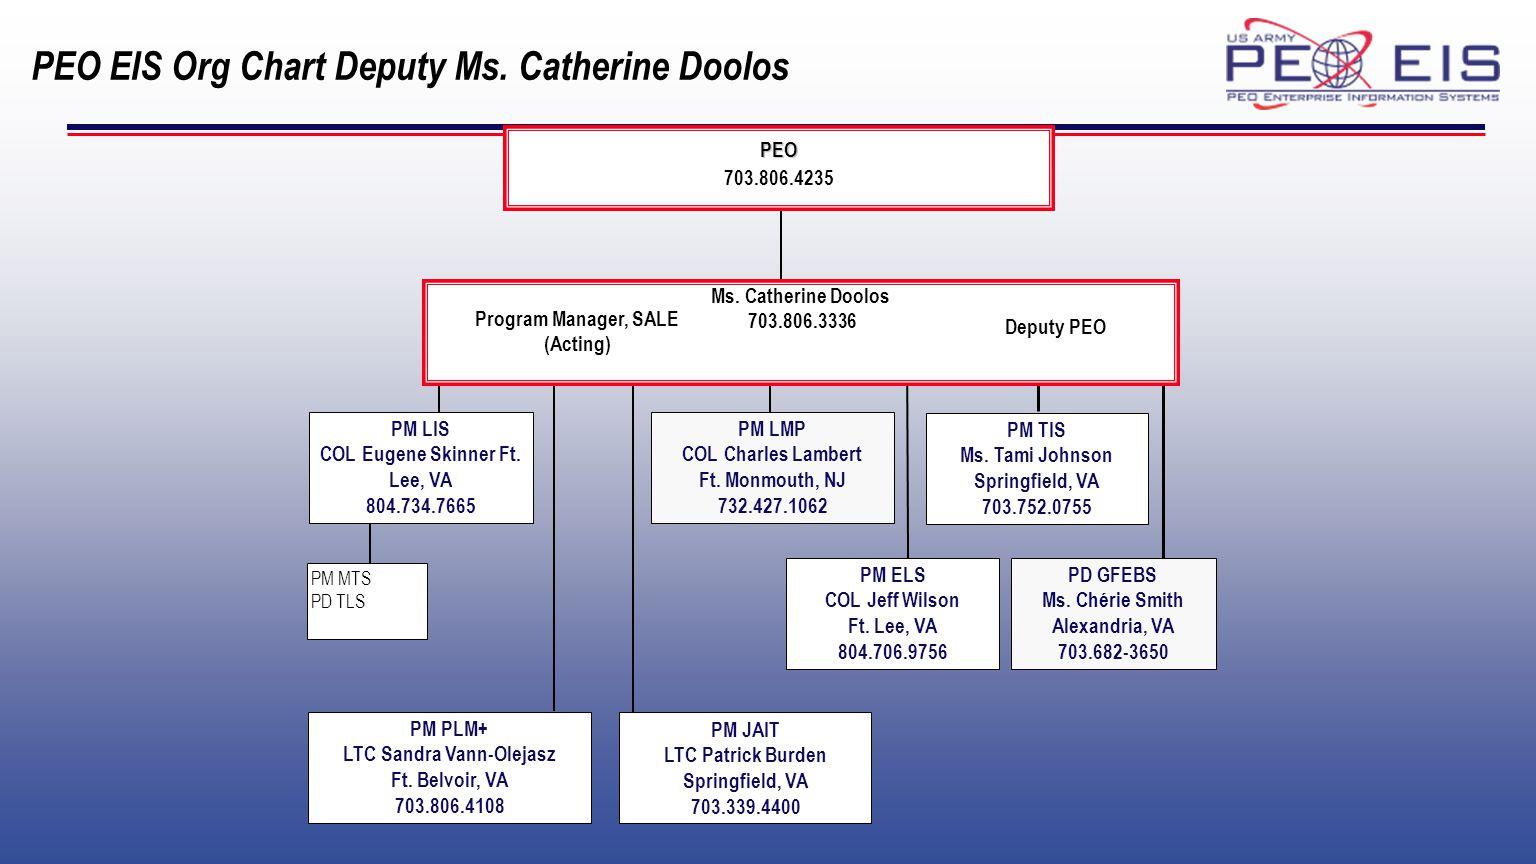 PEO EIS Org Chart Deputy Ms.Catherine Doolos PEO 703.806.4235 PM LMP COL Charles Lambert Ft.